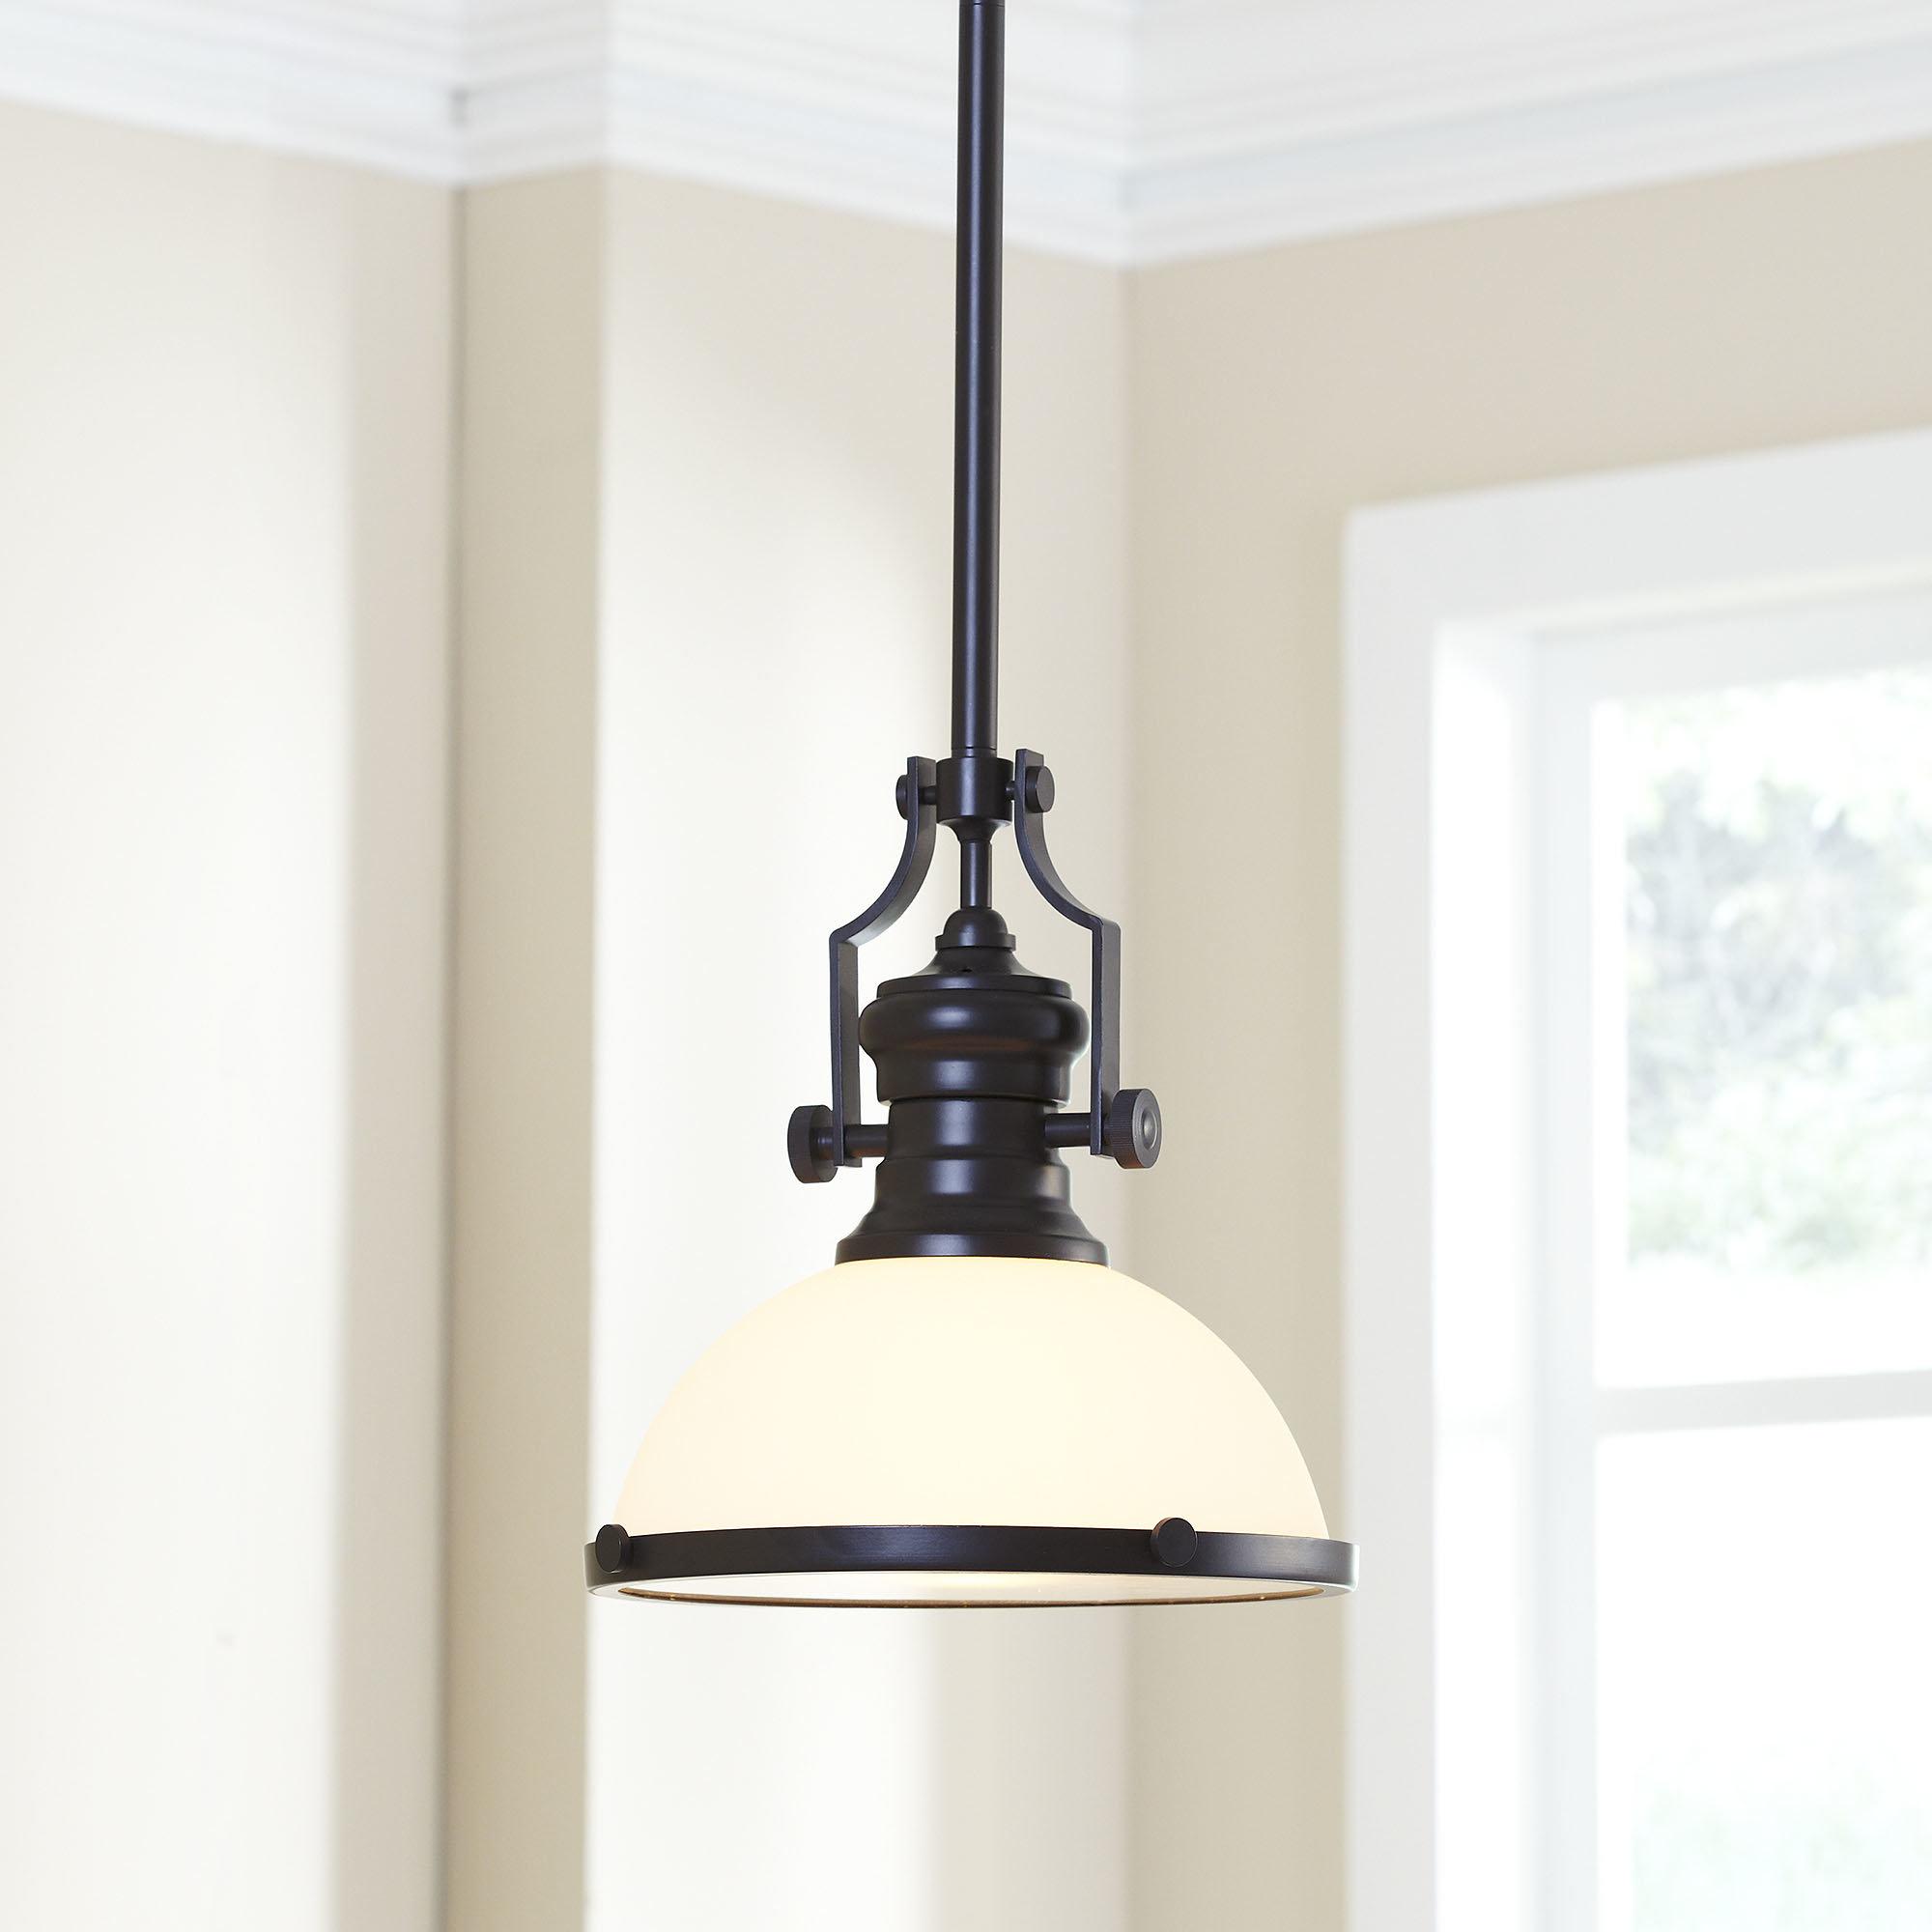 Proctor 1 Light Bowl Pendants In Fashionable Proctor 1 Light Bowl Pendant (Gallery 4 of 20)